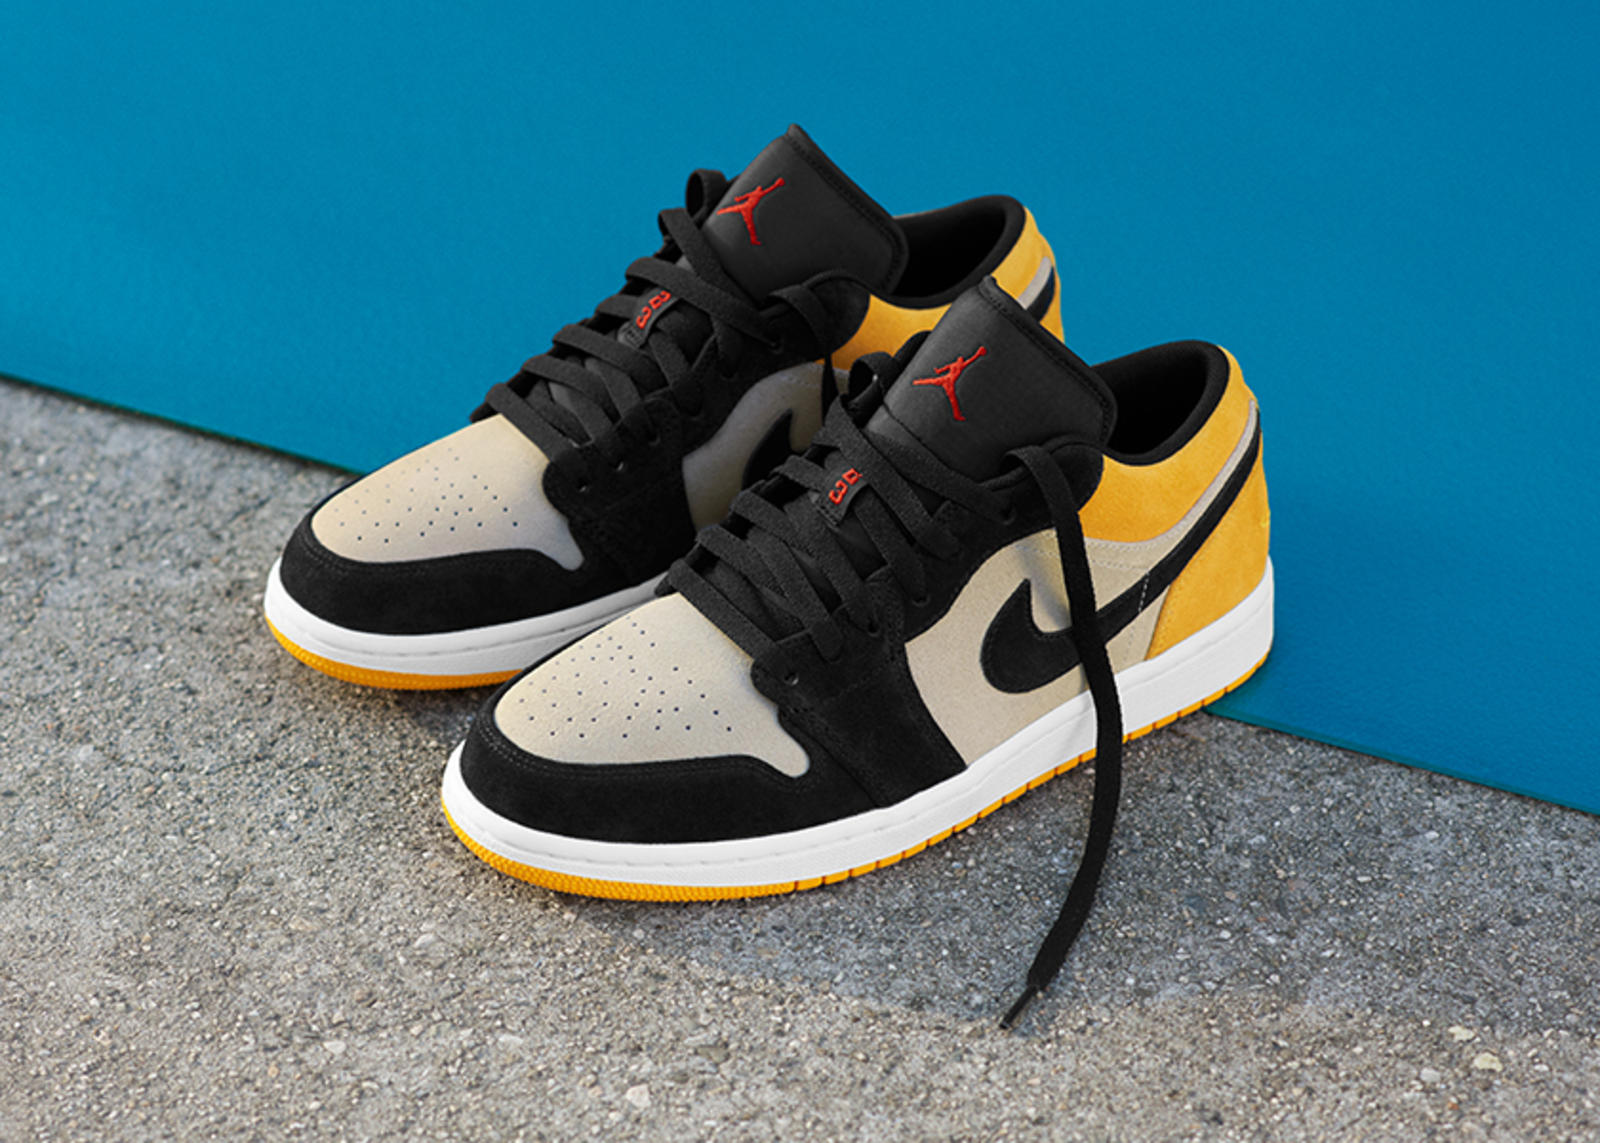 Air Jordan 1 and Nike SB Collaboration